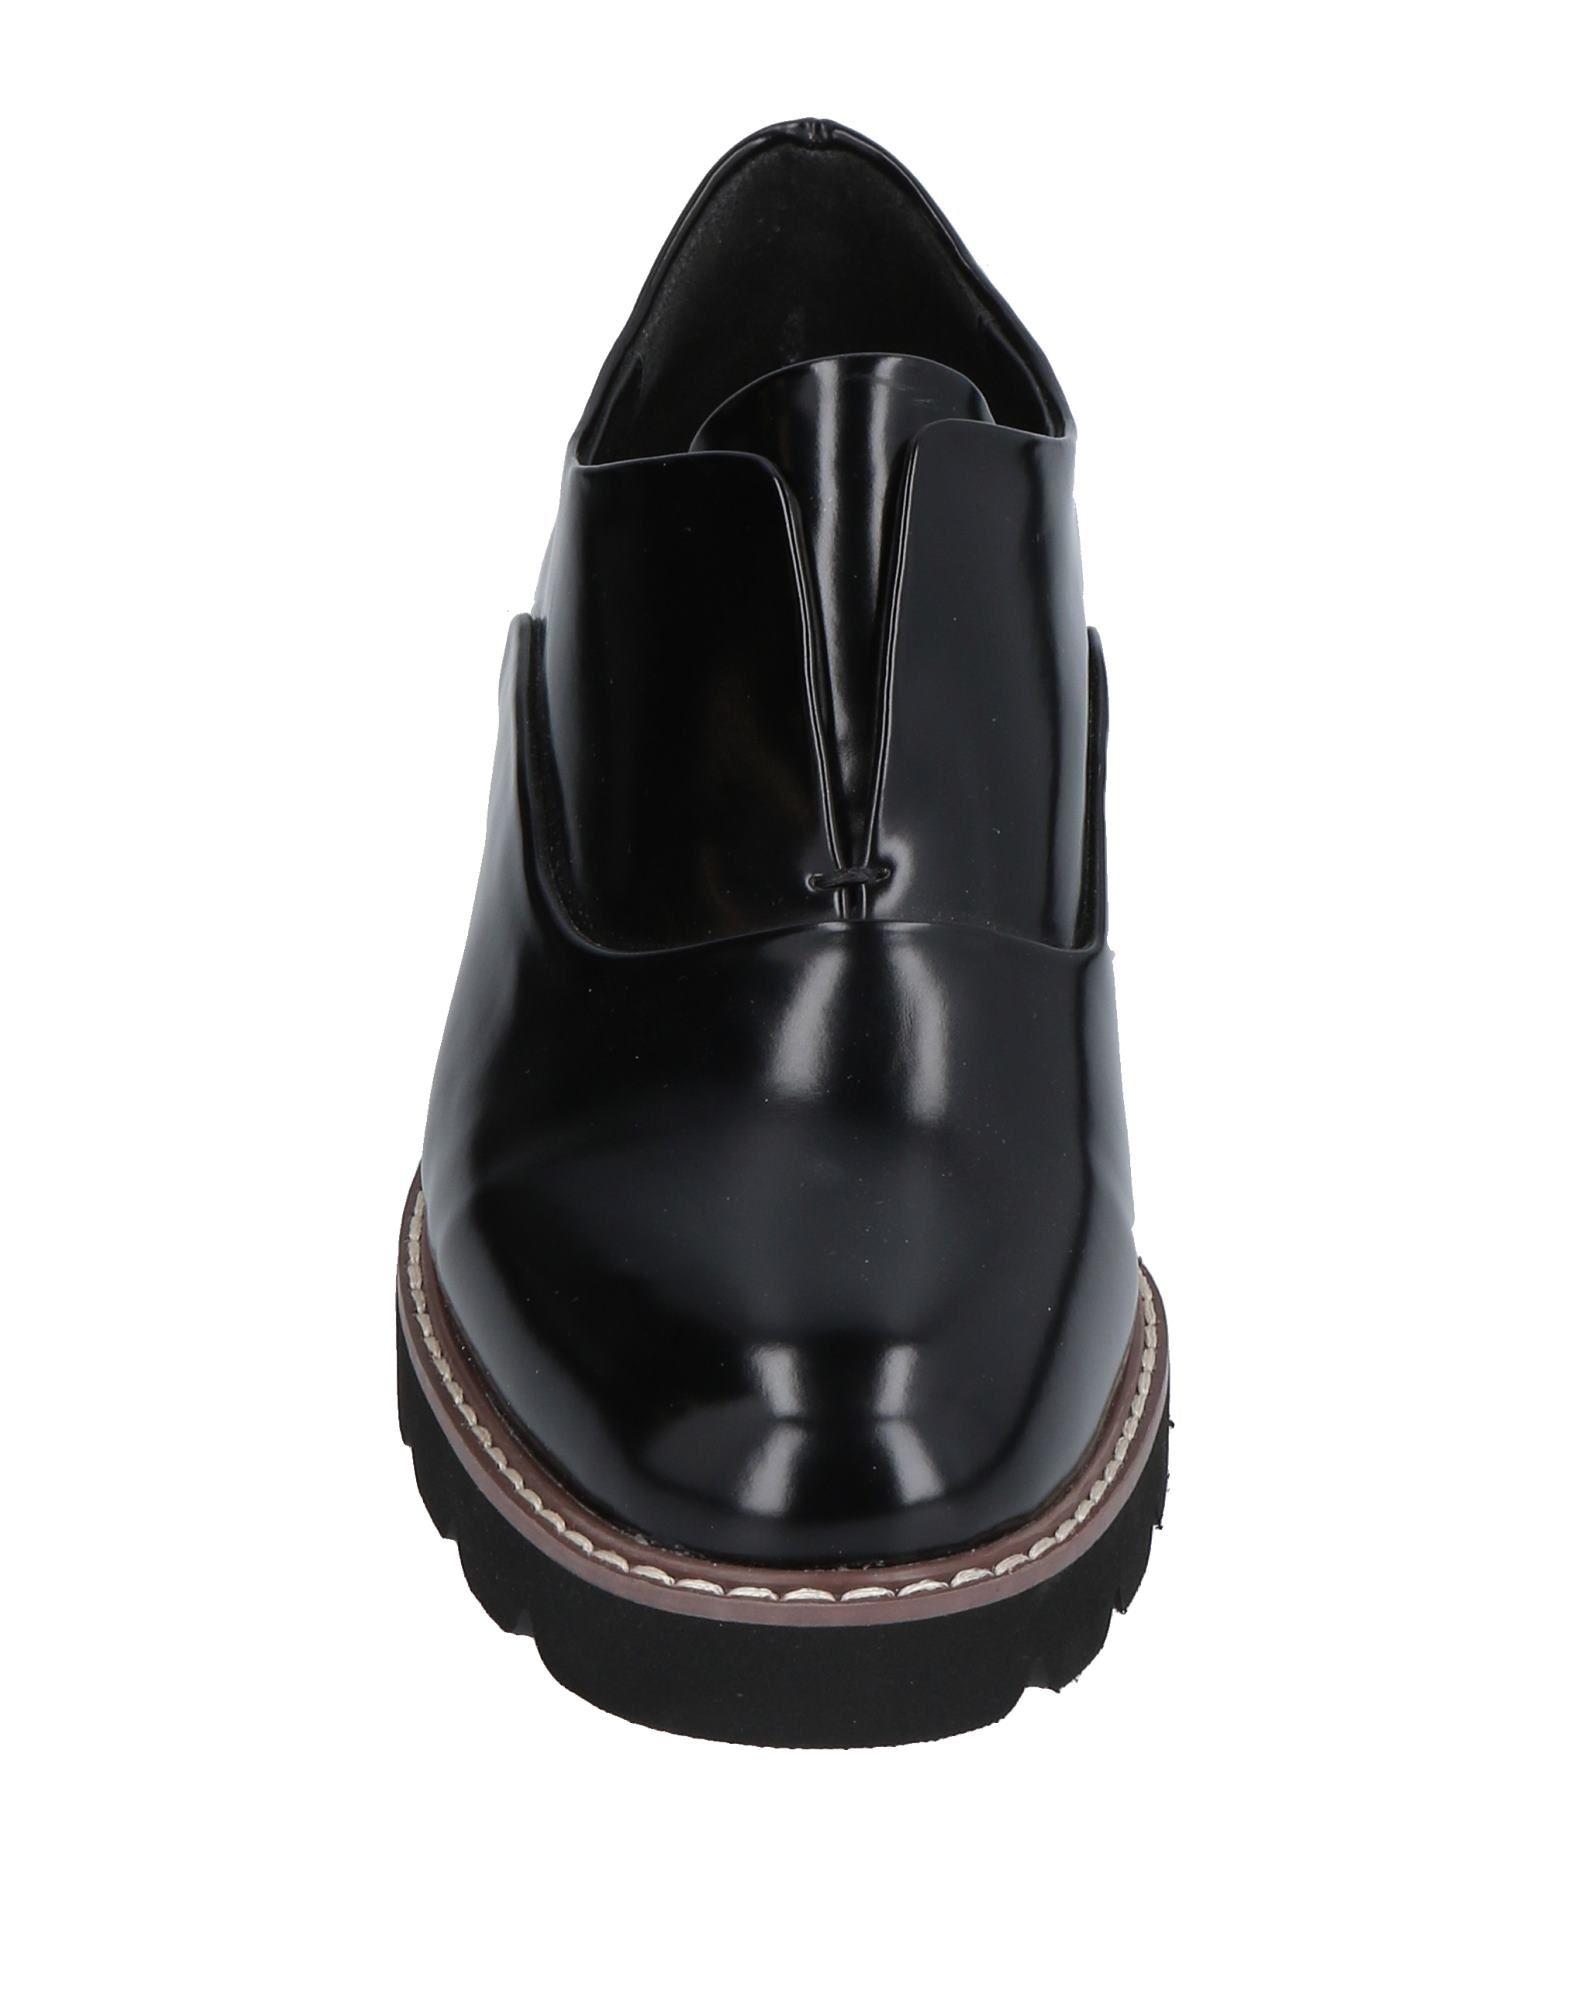 Bibi 11472110NV Lou Mokassins Damen  11472110NV Bibi Gute Qualität beliebte Schuhe 65c72c